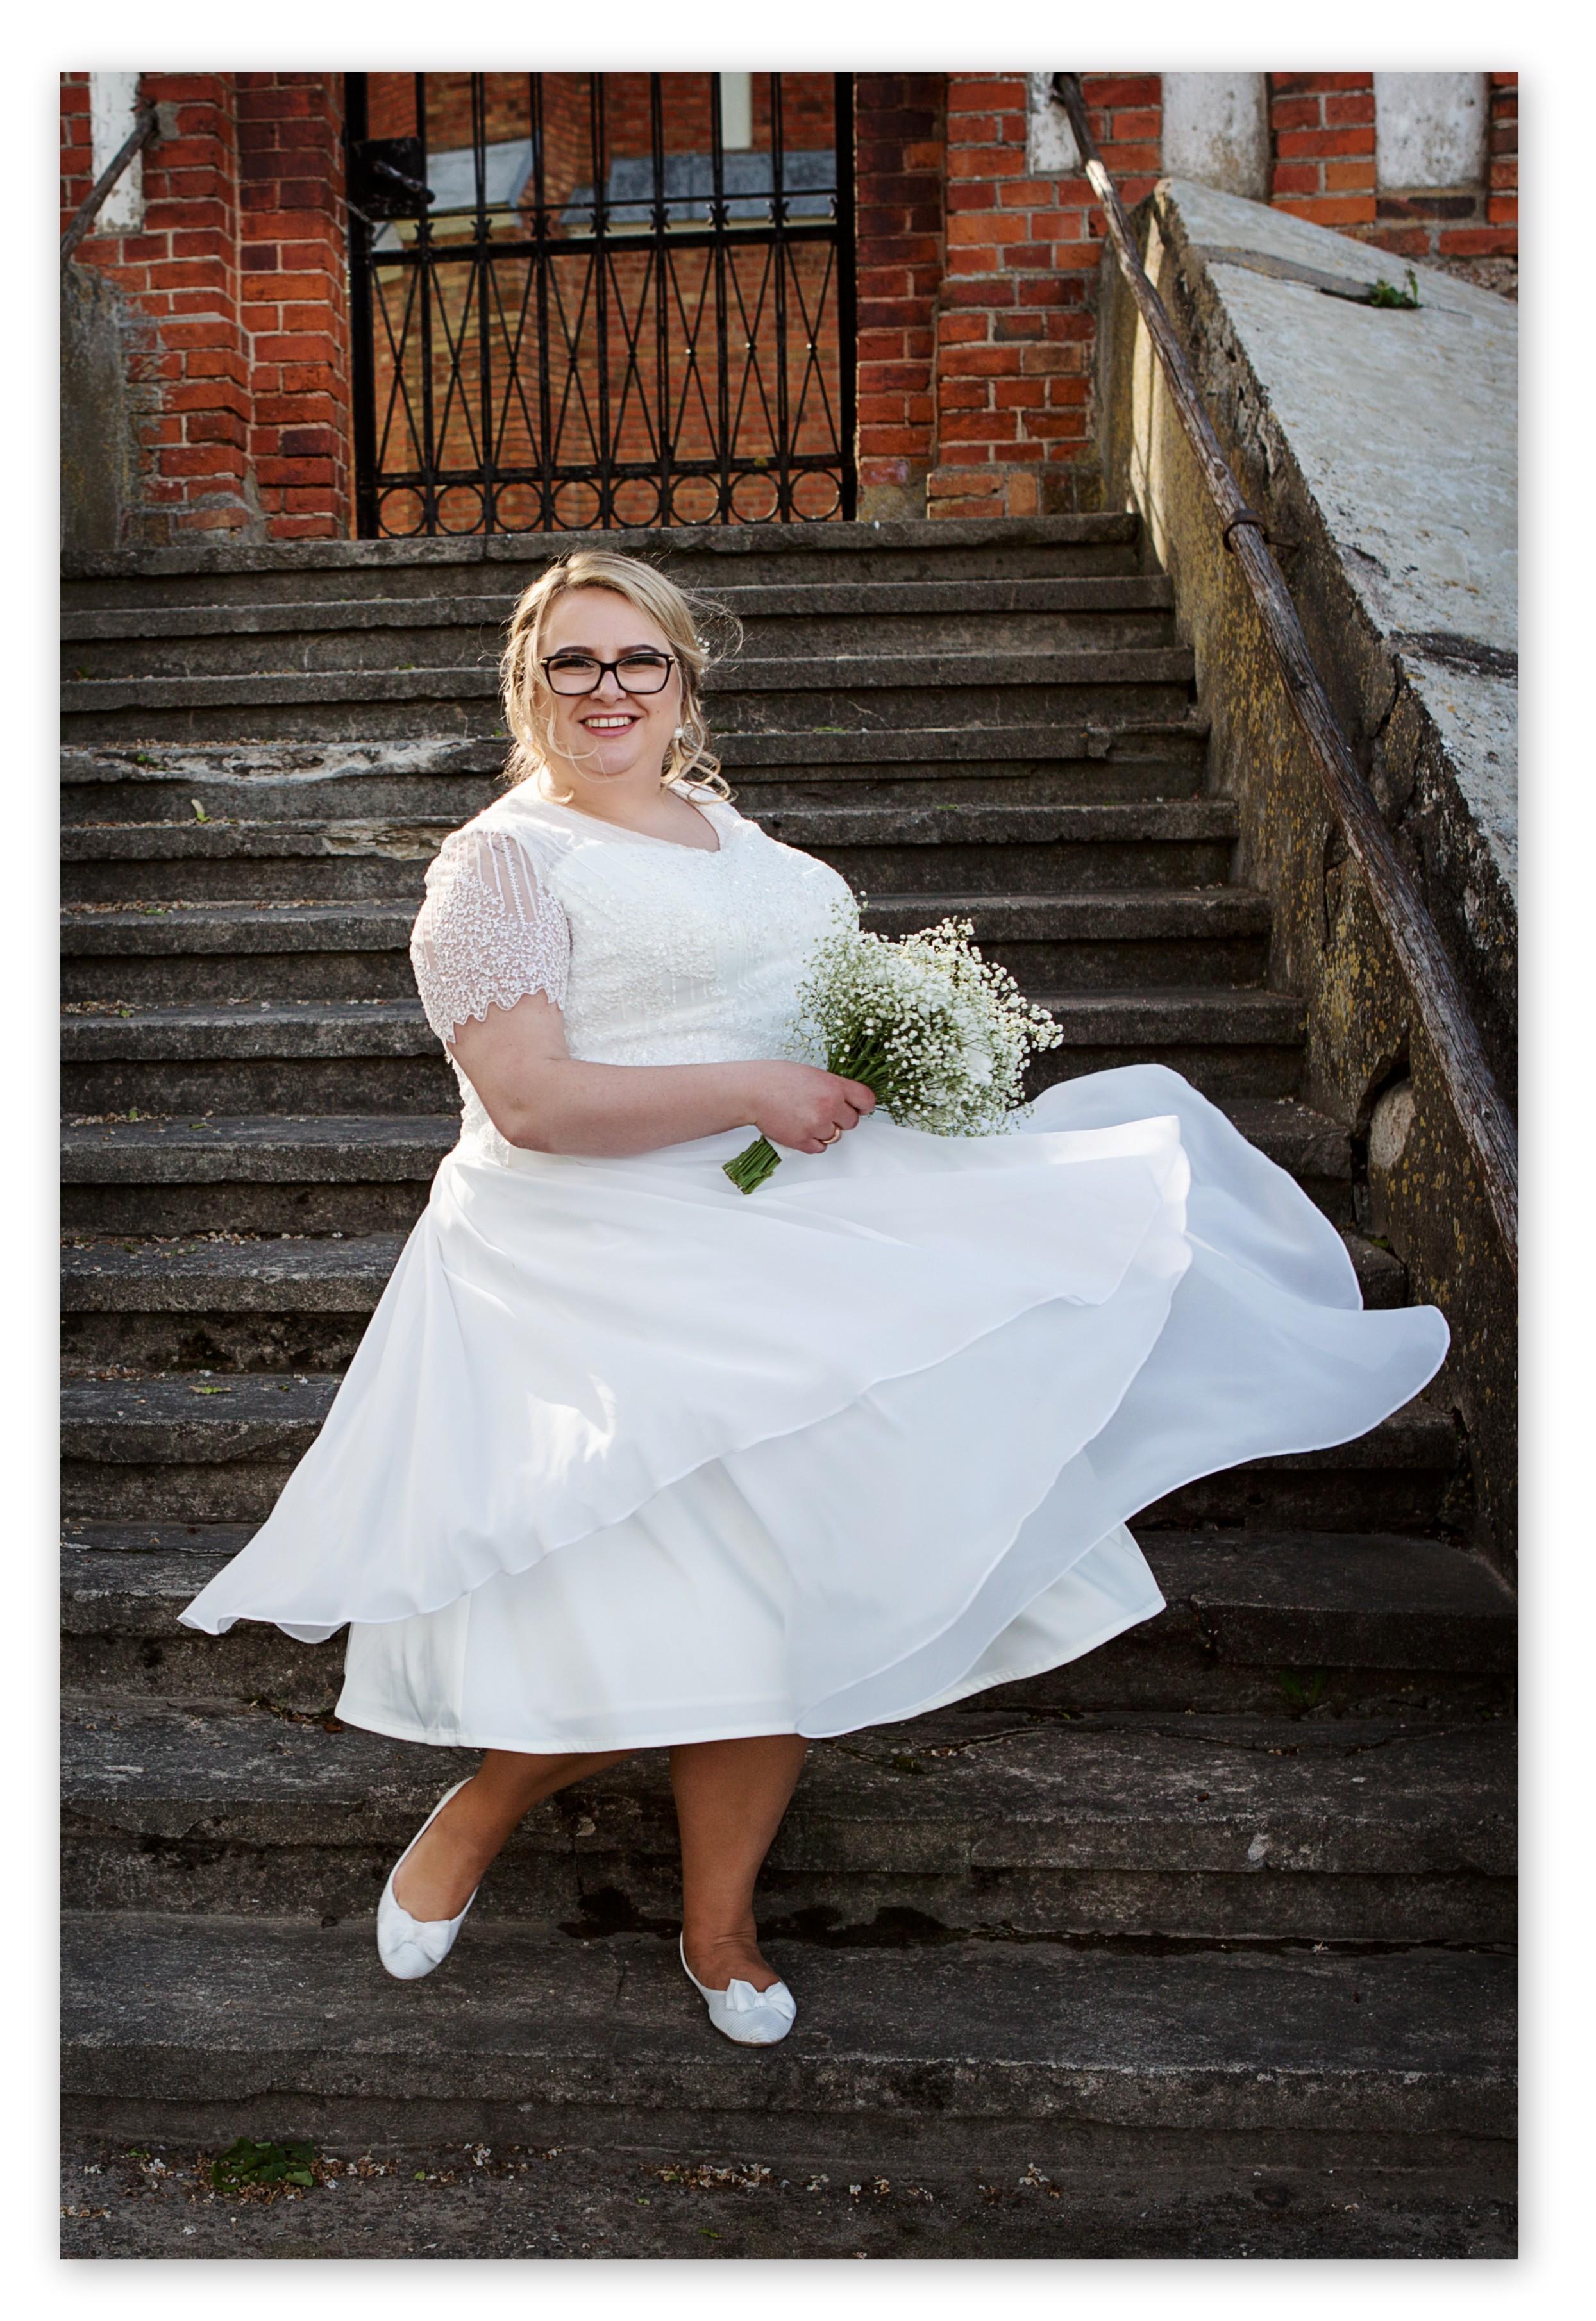 Midi ilgio nuotakos suknelė